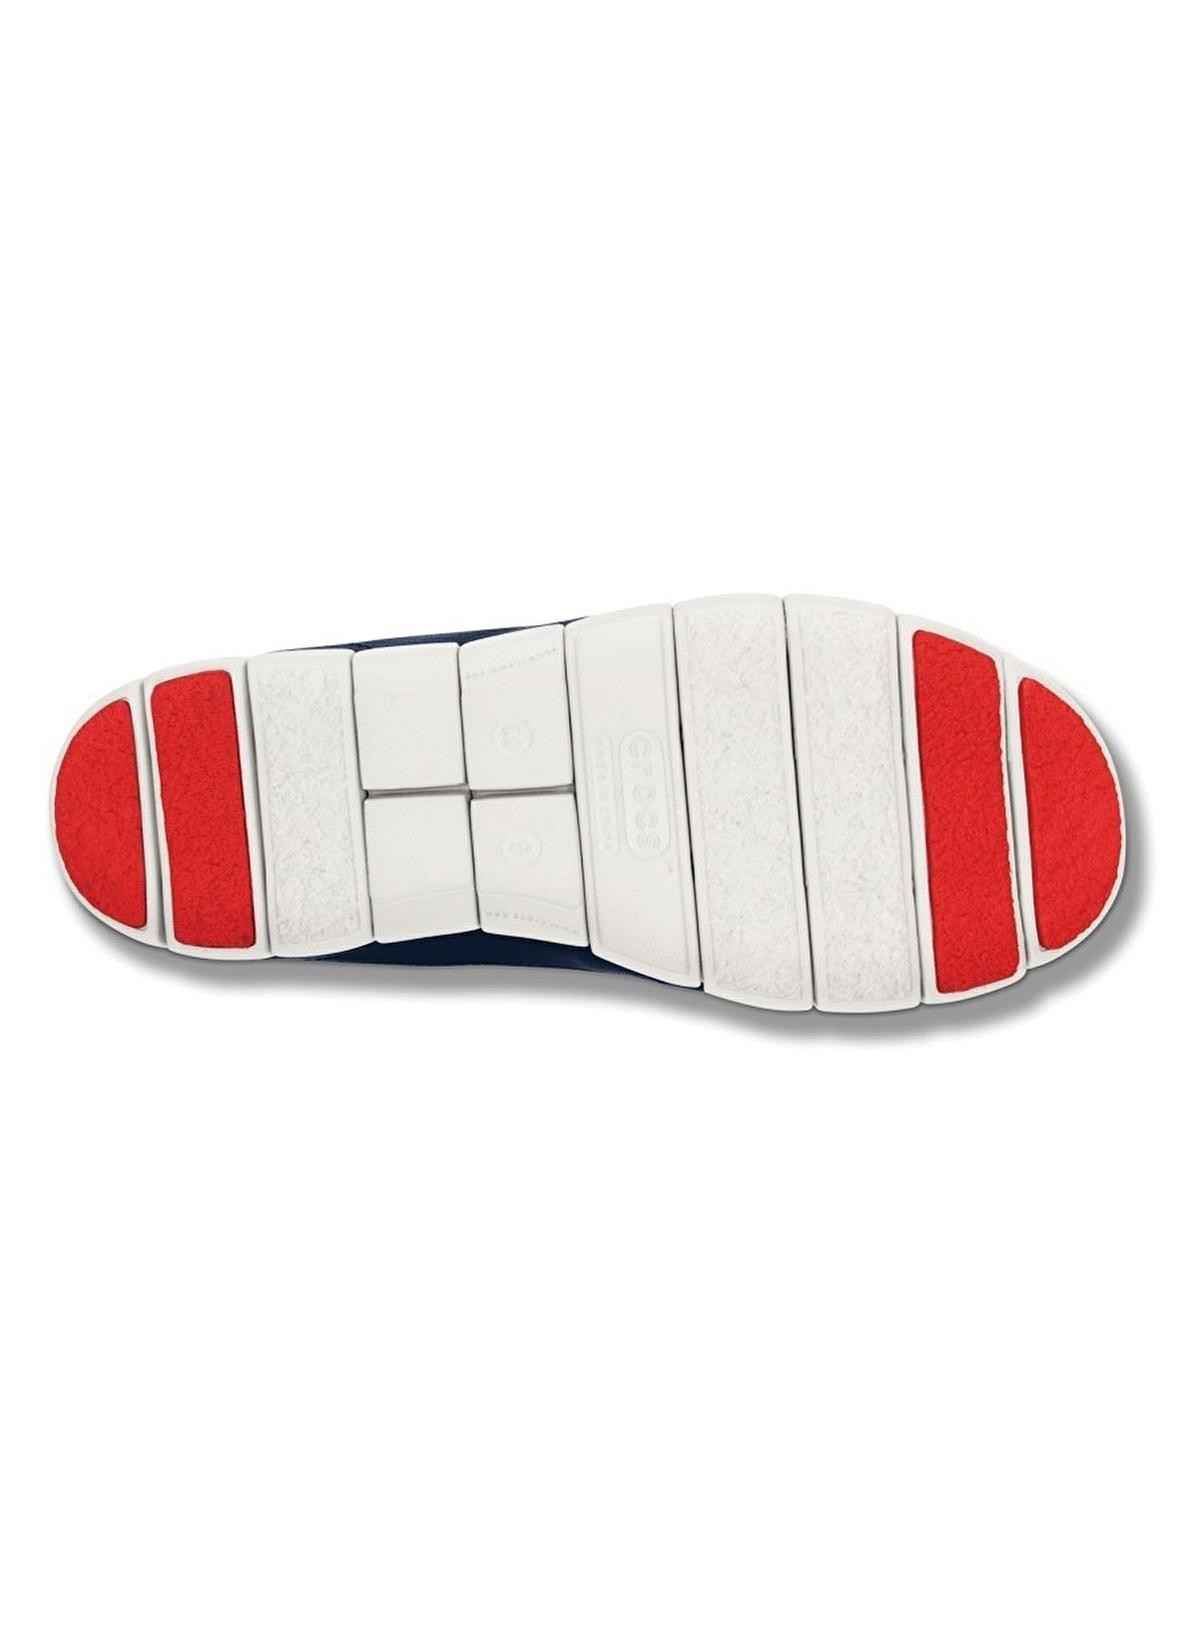 b1f689935f2c1c Crocs Erkek Stretch Sole Lace-Up Men Ayakkabı Lacivert-İnci Beyazı ...